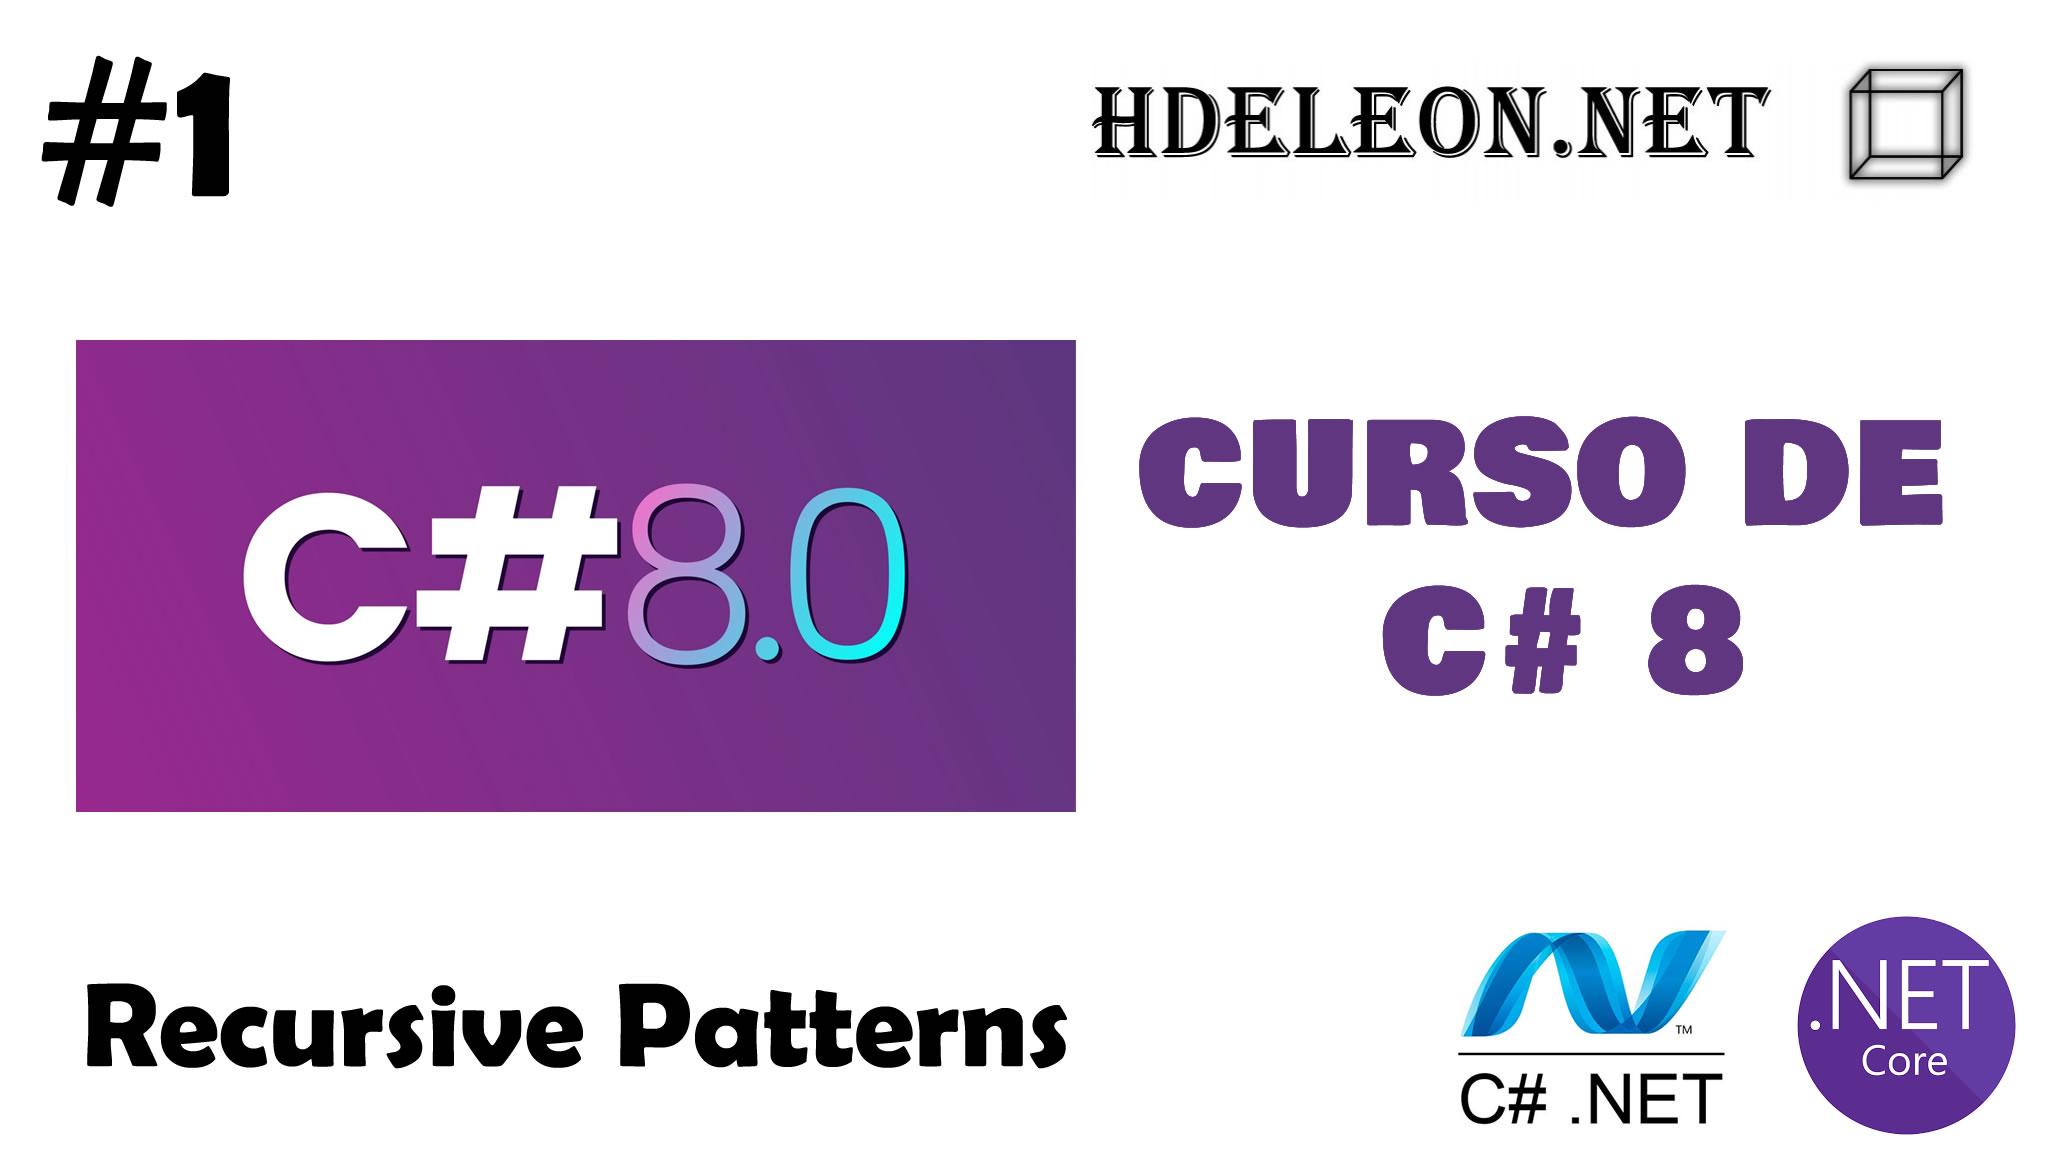 Curso gratuito de C# 8 .Net, Recursive Patterns, #1